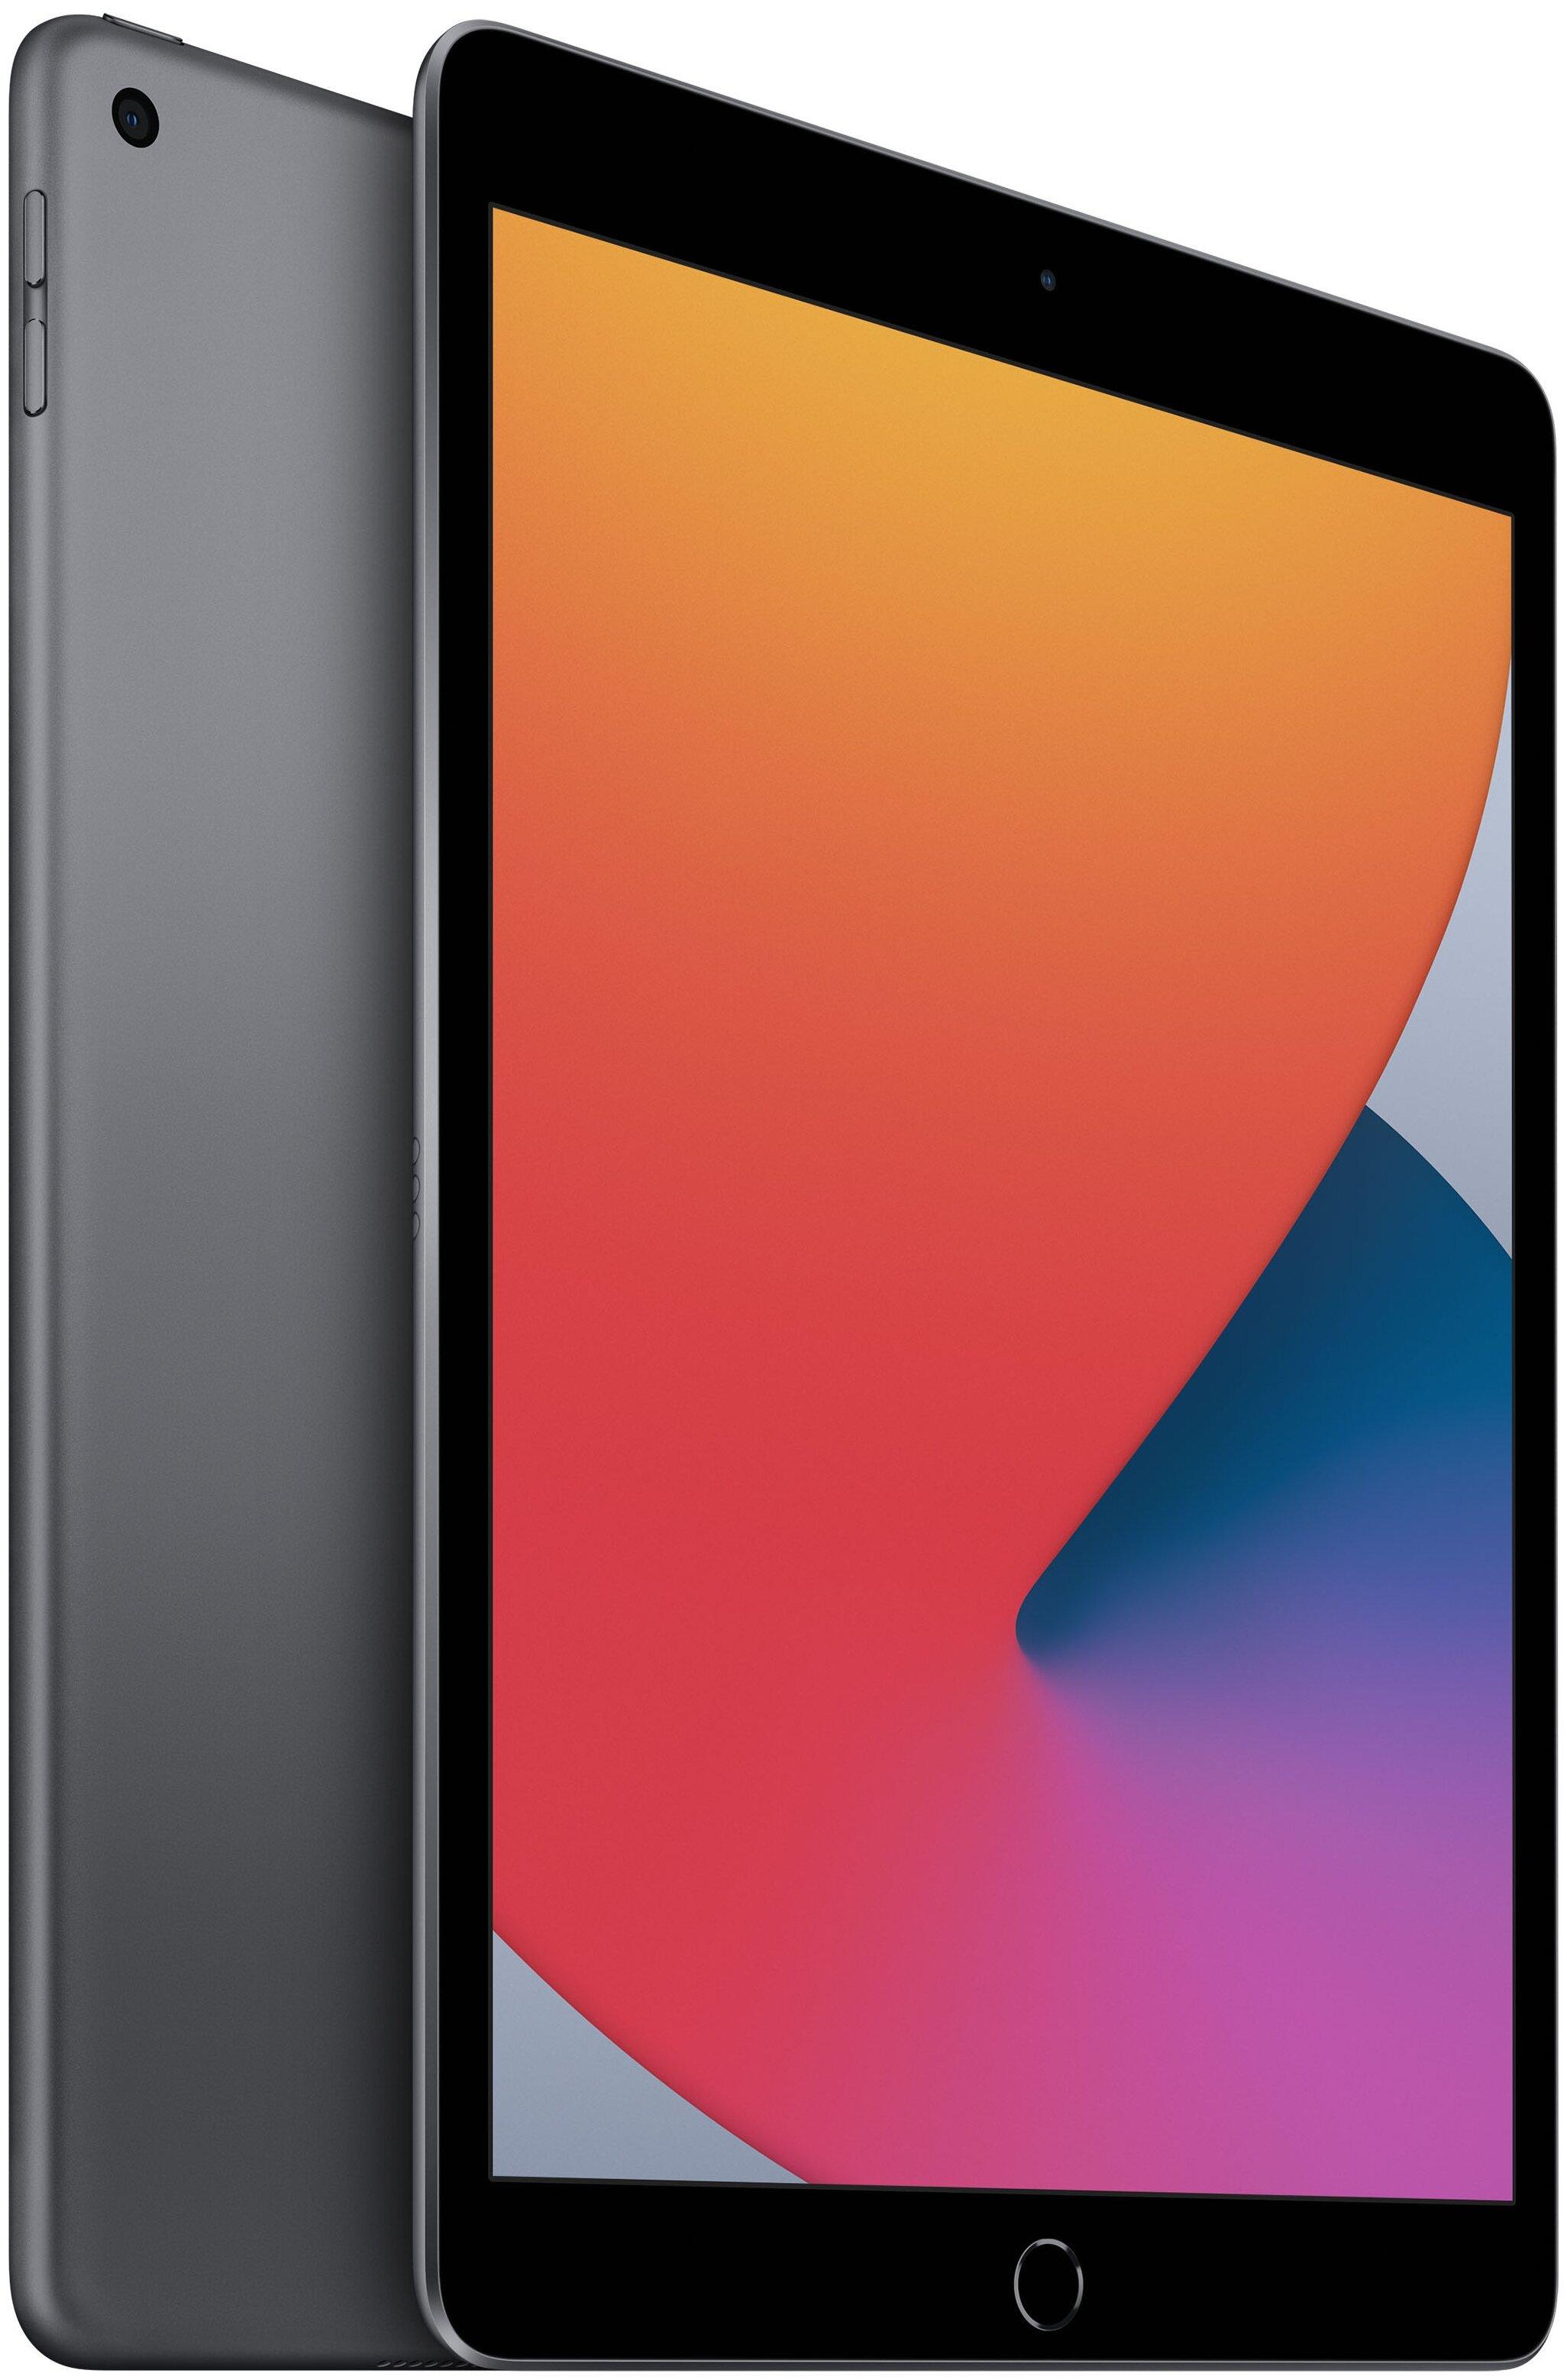 Apple iPad (2020) 128Gb Wi-Fi - встроенная память: 128ГБ